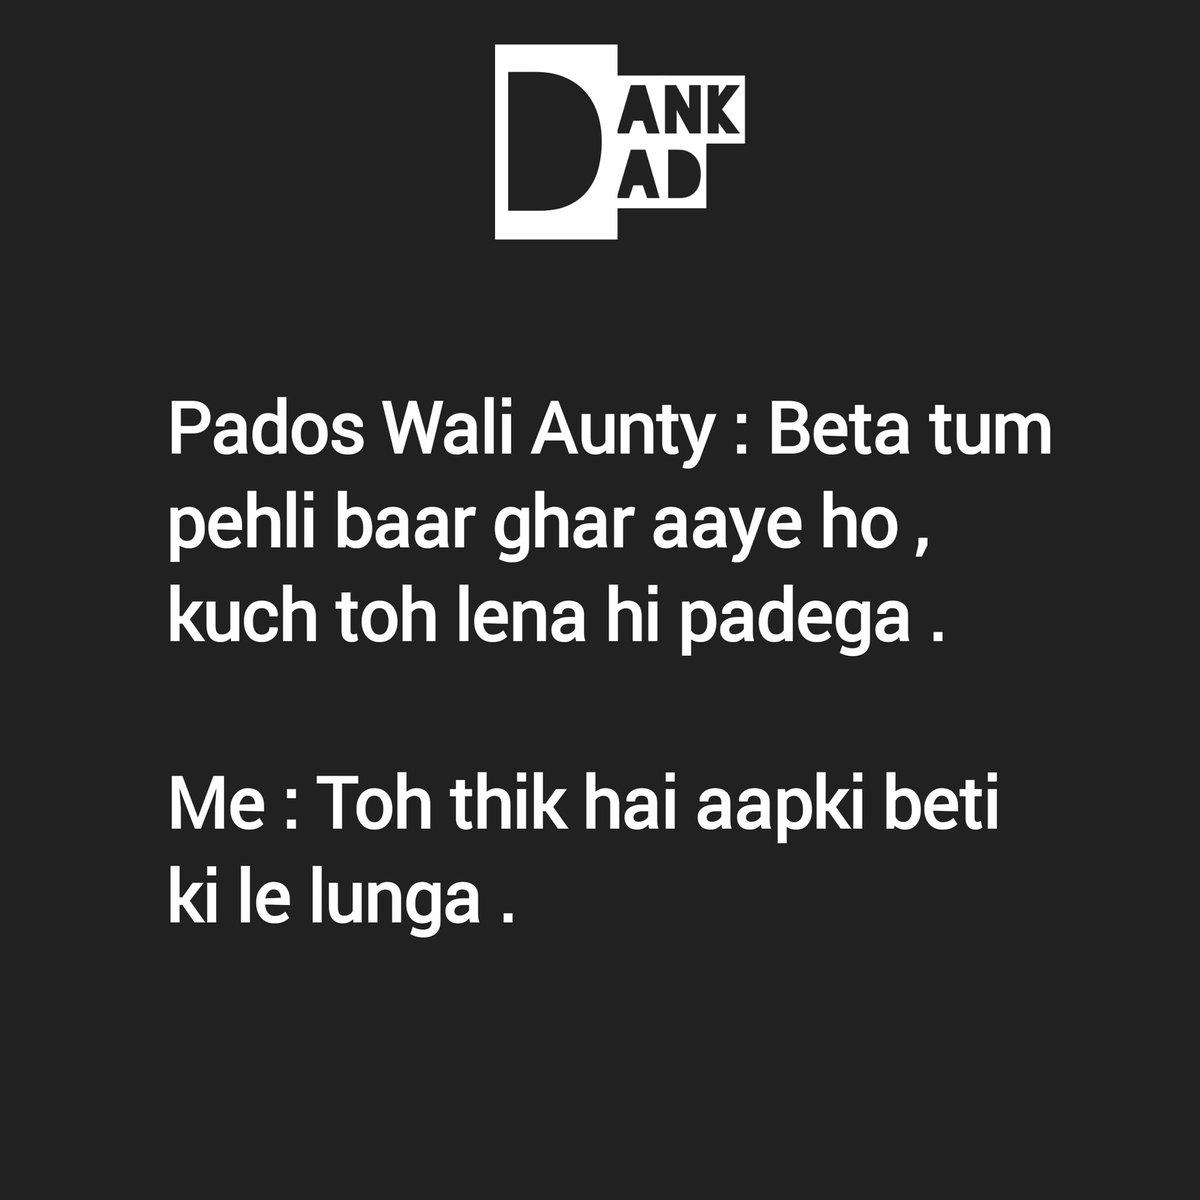 Follow @_dank_dad_ for more ....#fun #jokeoftheday #laugh  #dankjokes #nonvegjokes #follow #funny #jokes #sarcasm #FF #likes #comedyindia #backchodi #sacredmemes #bollywoodpic.twitter.com/z1dqyJAb2E